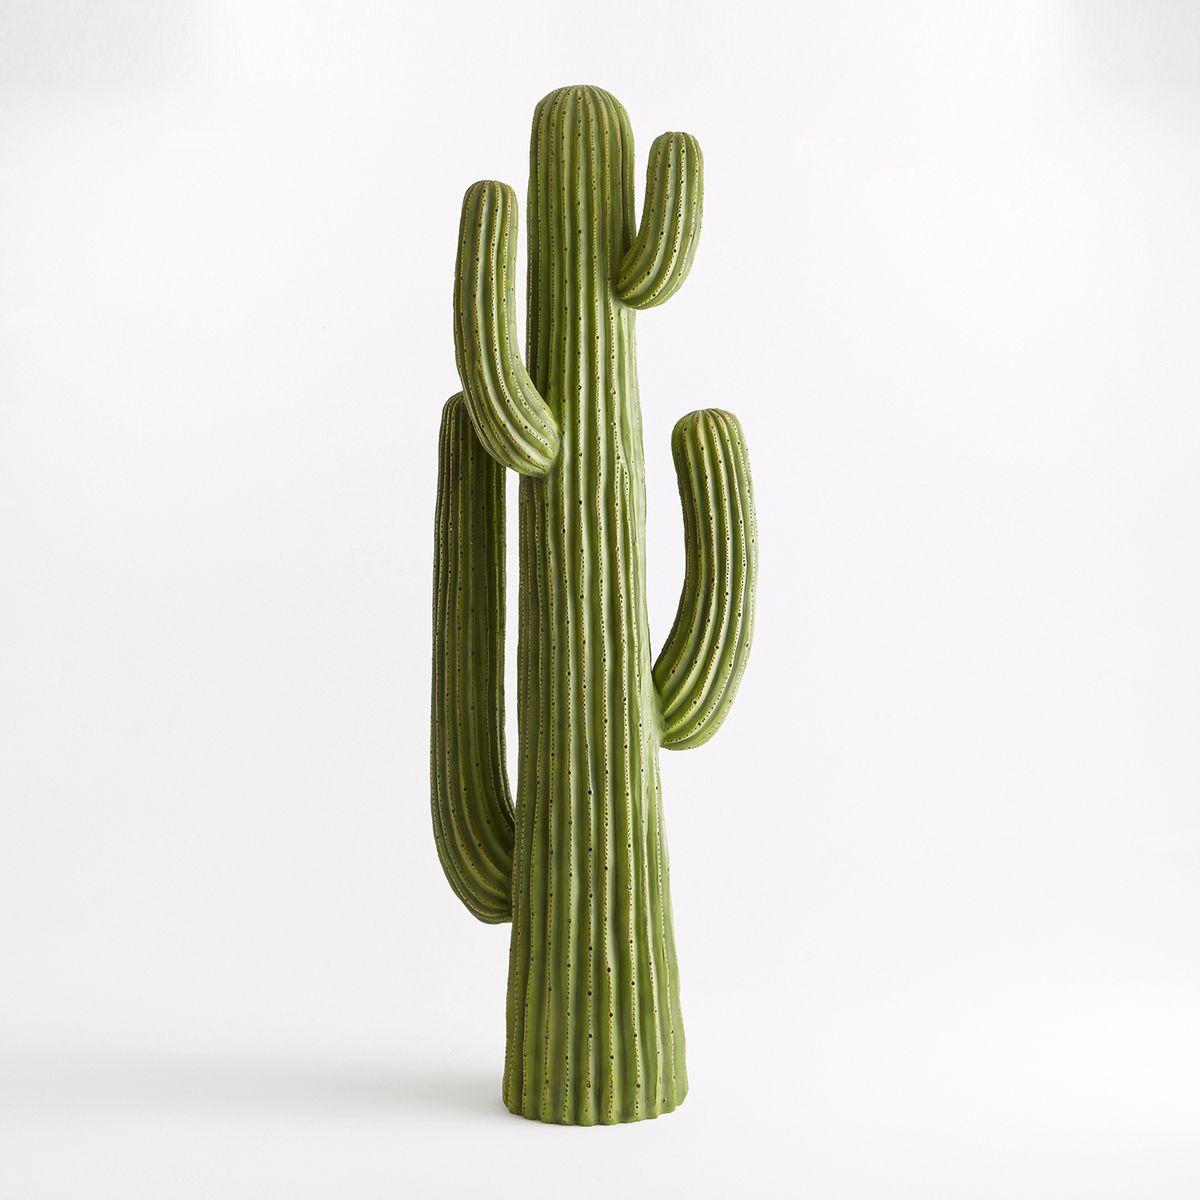 Cactus résine Quevedo